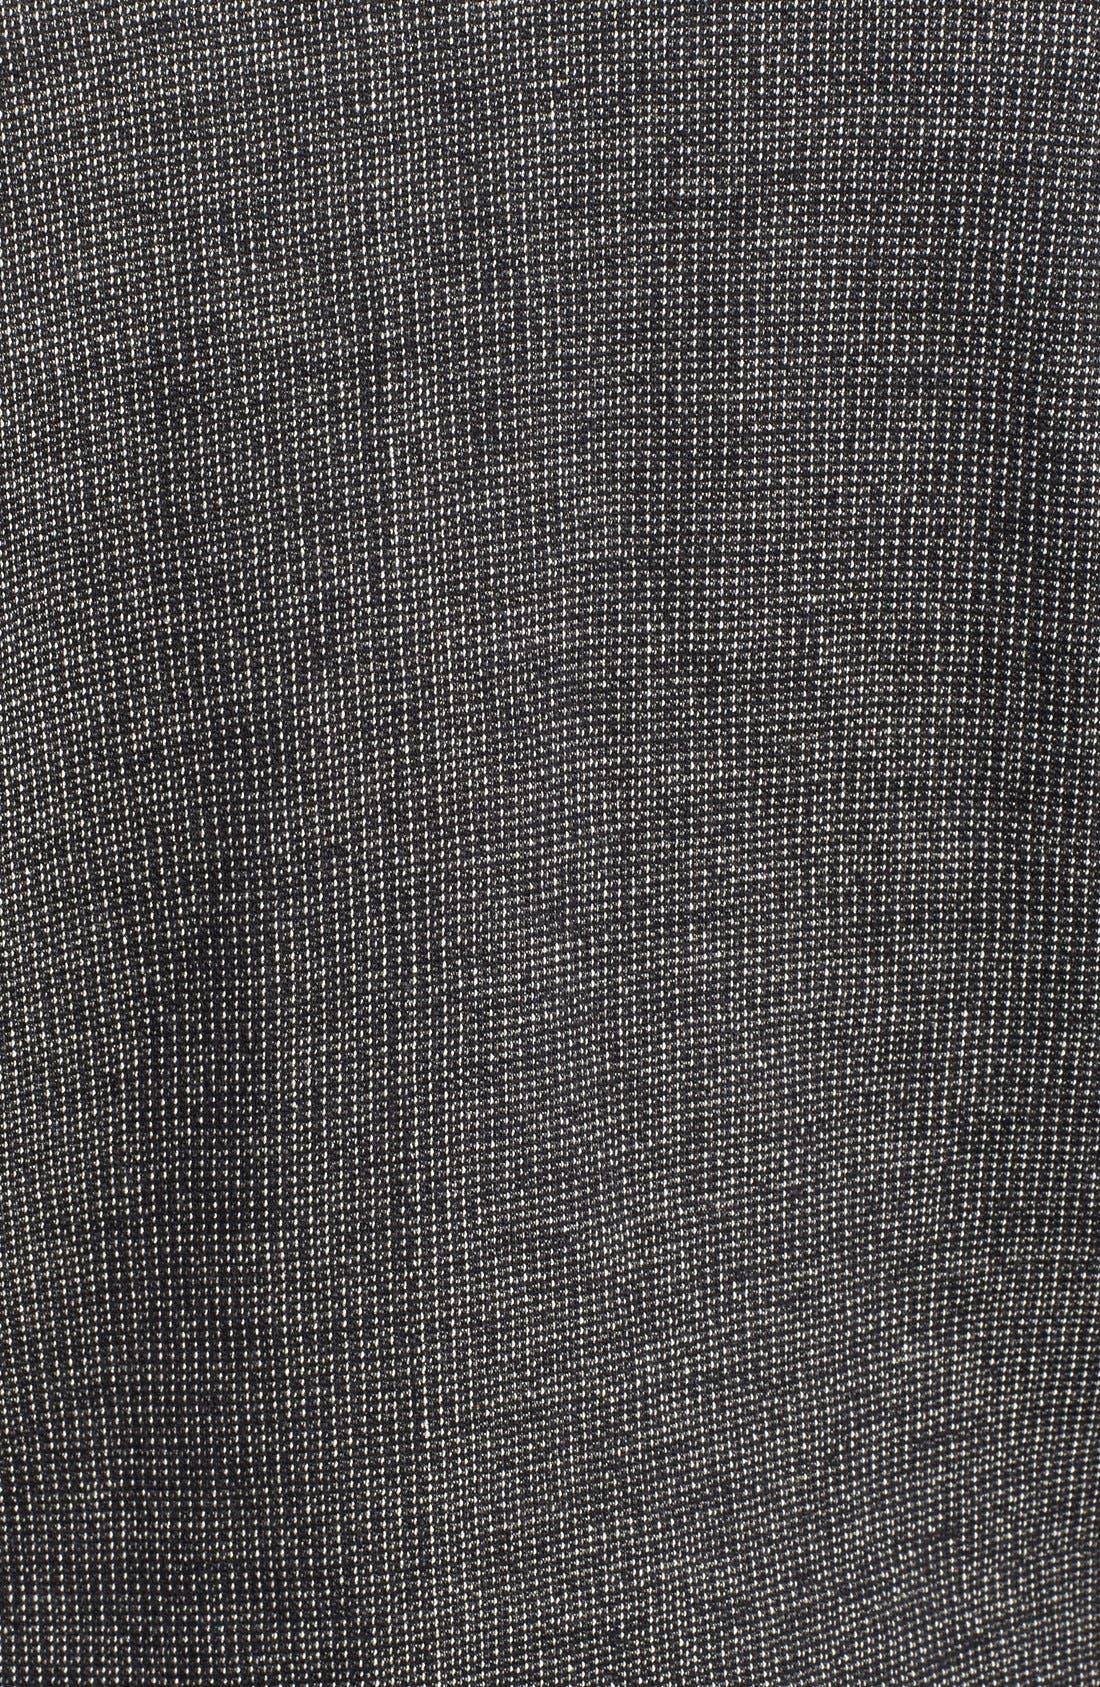 Alternate Image 3  - RVCA 'Capo' Pullover Knit Hoodie